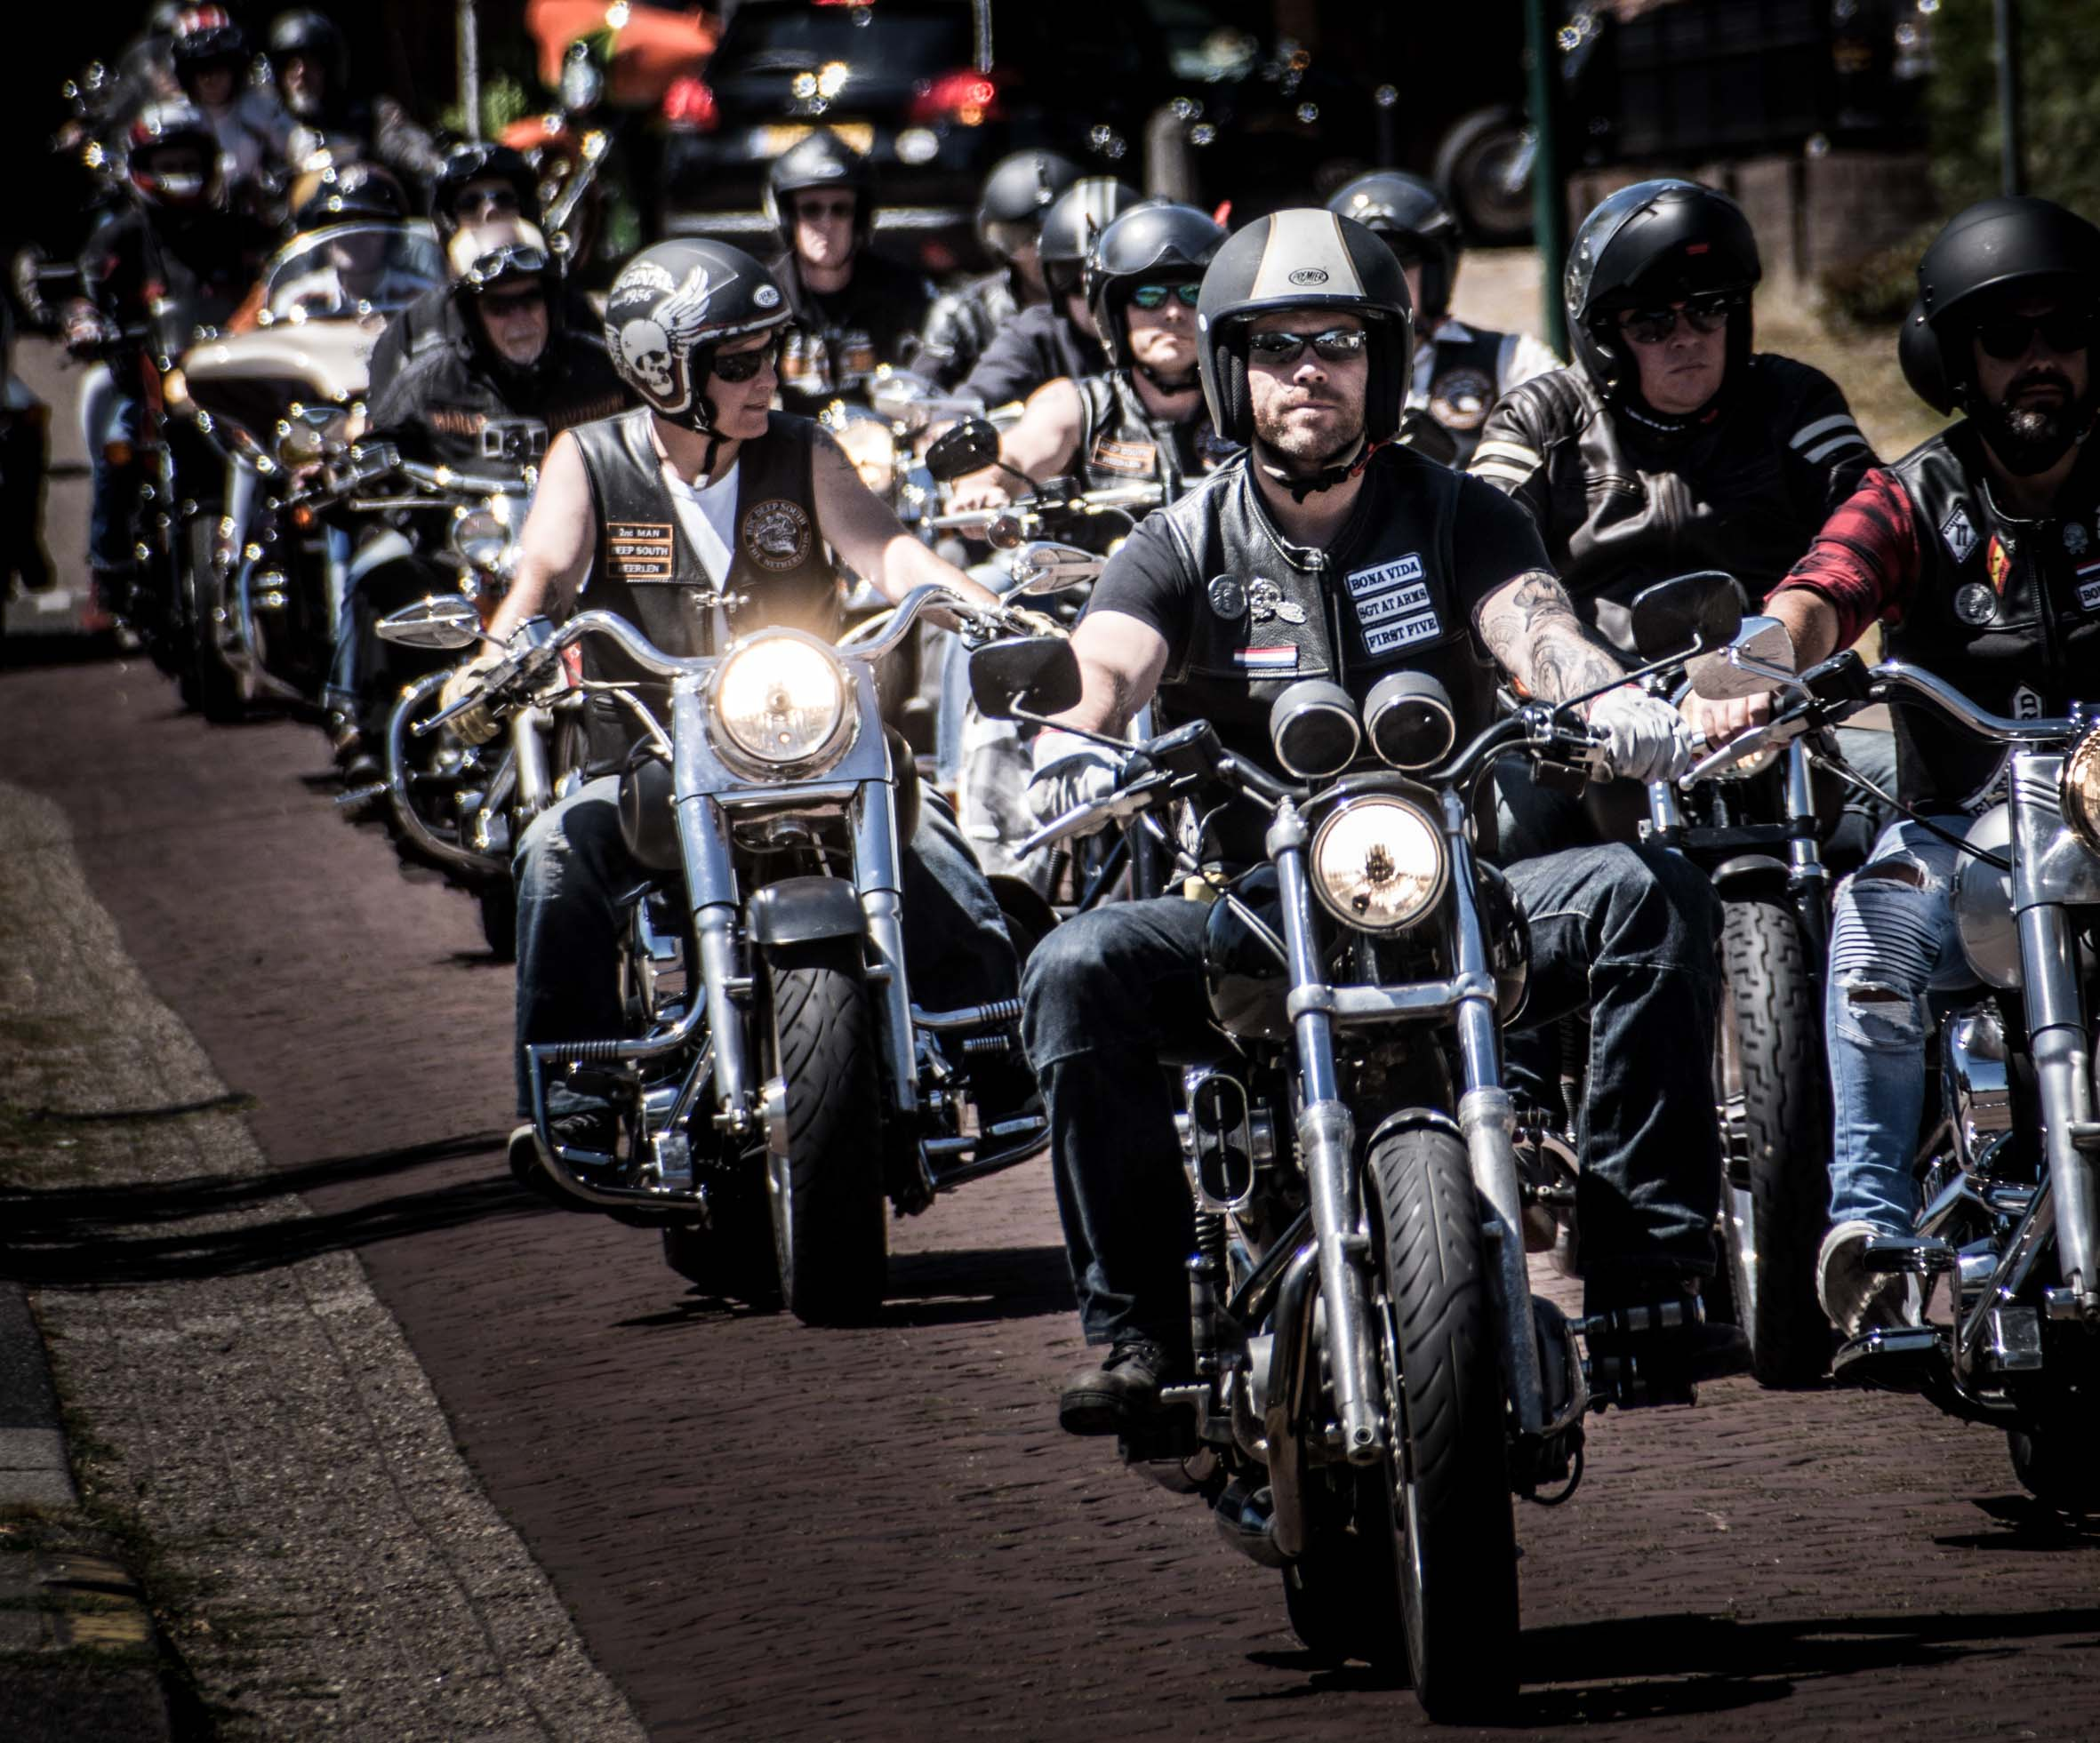 180701 Harley Davidson small-09255